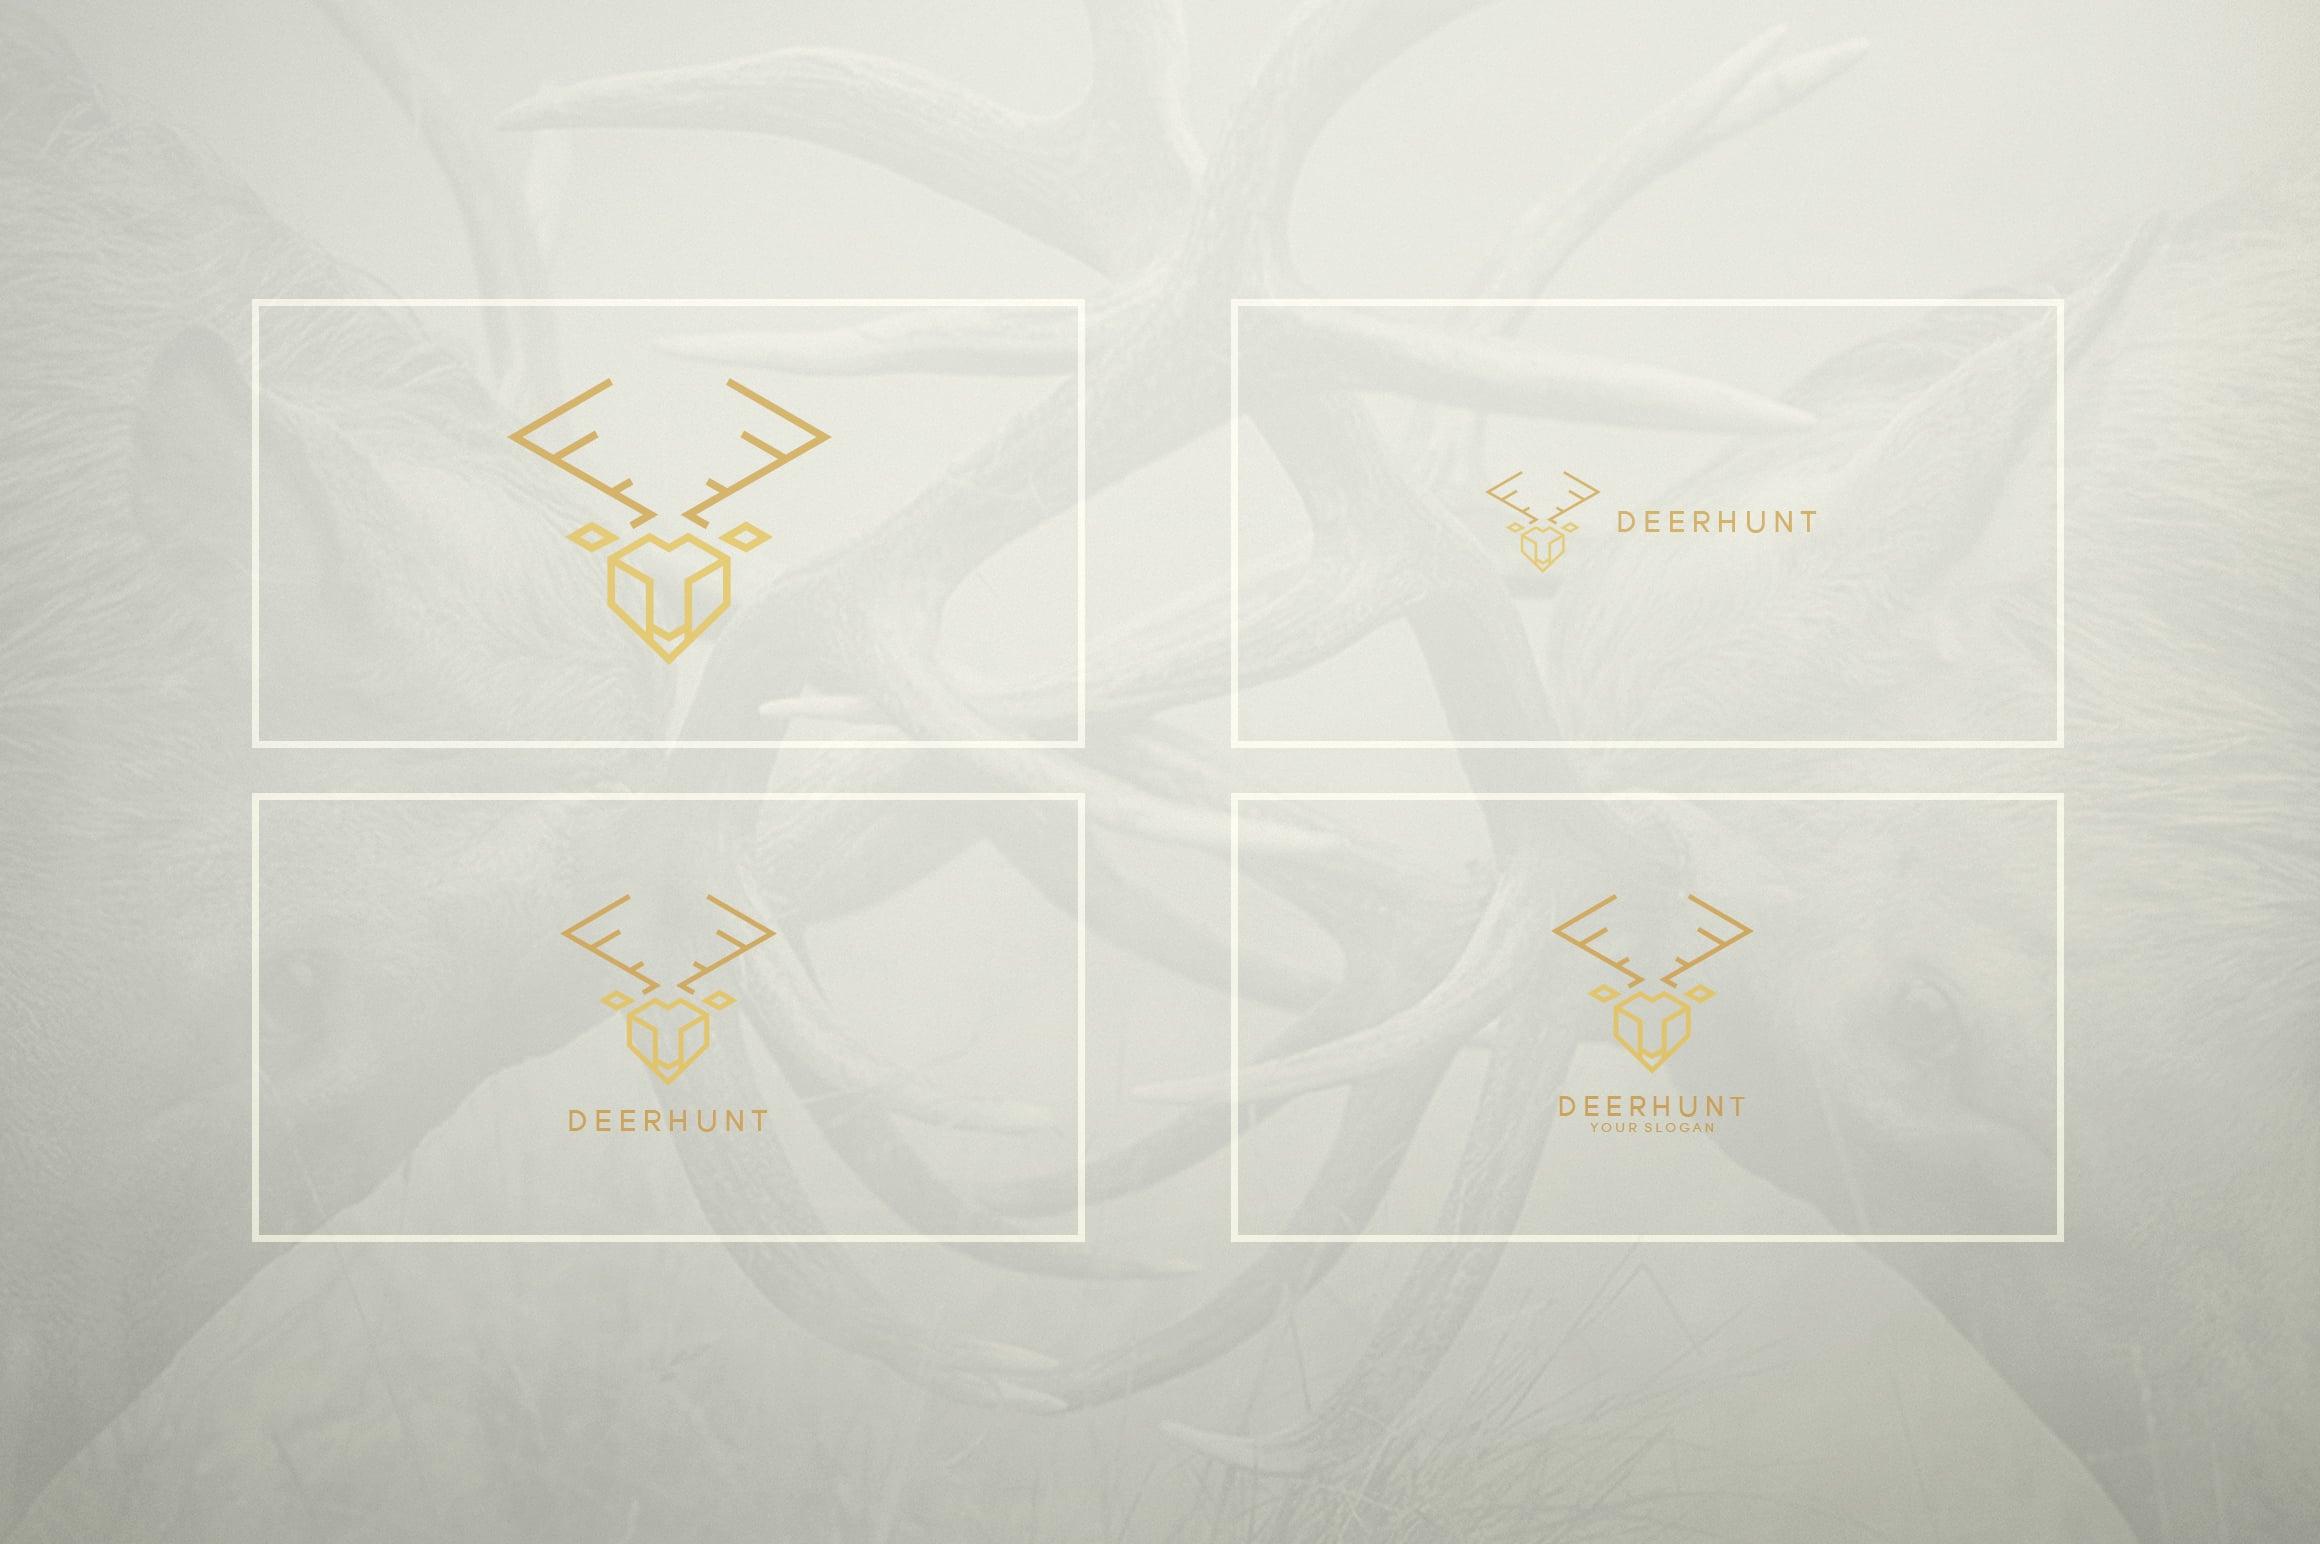 17 Geometric Animal Icons and Logos - 12